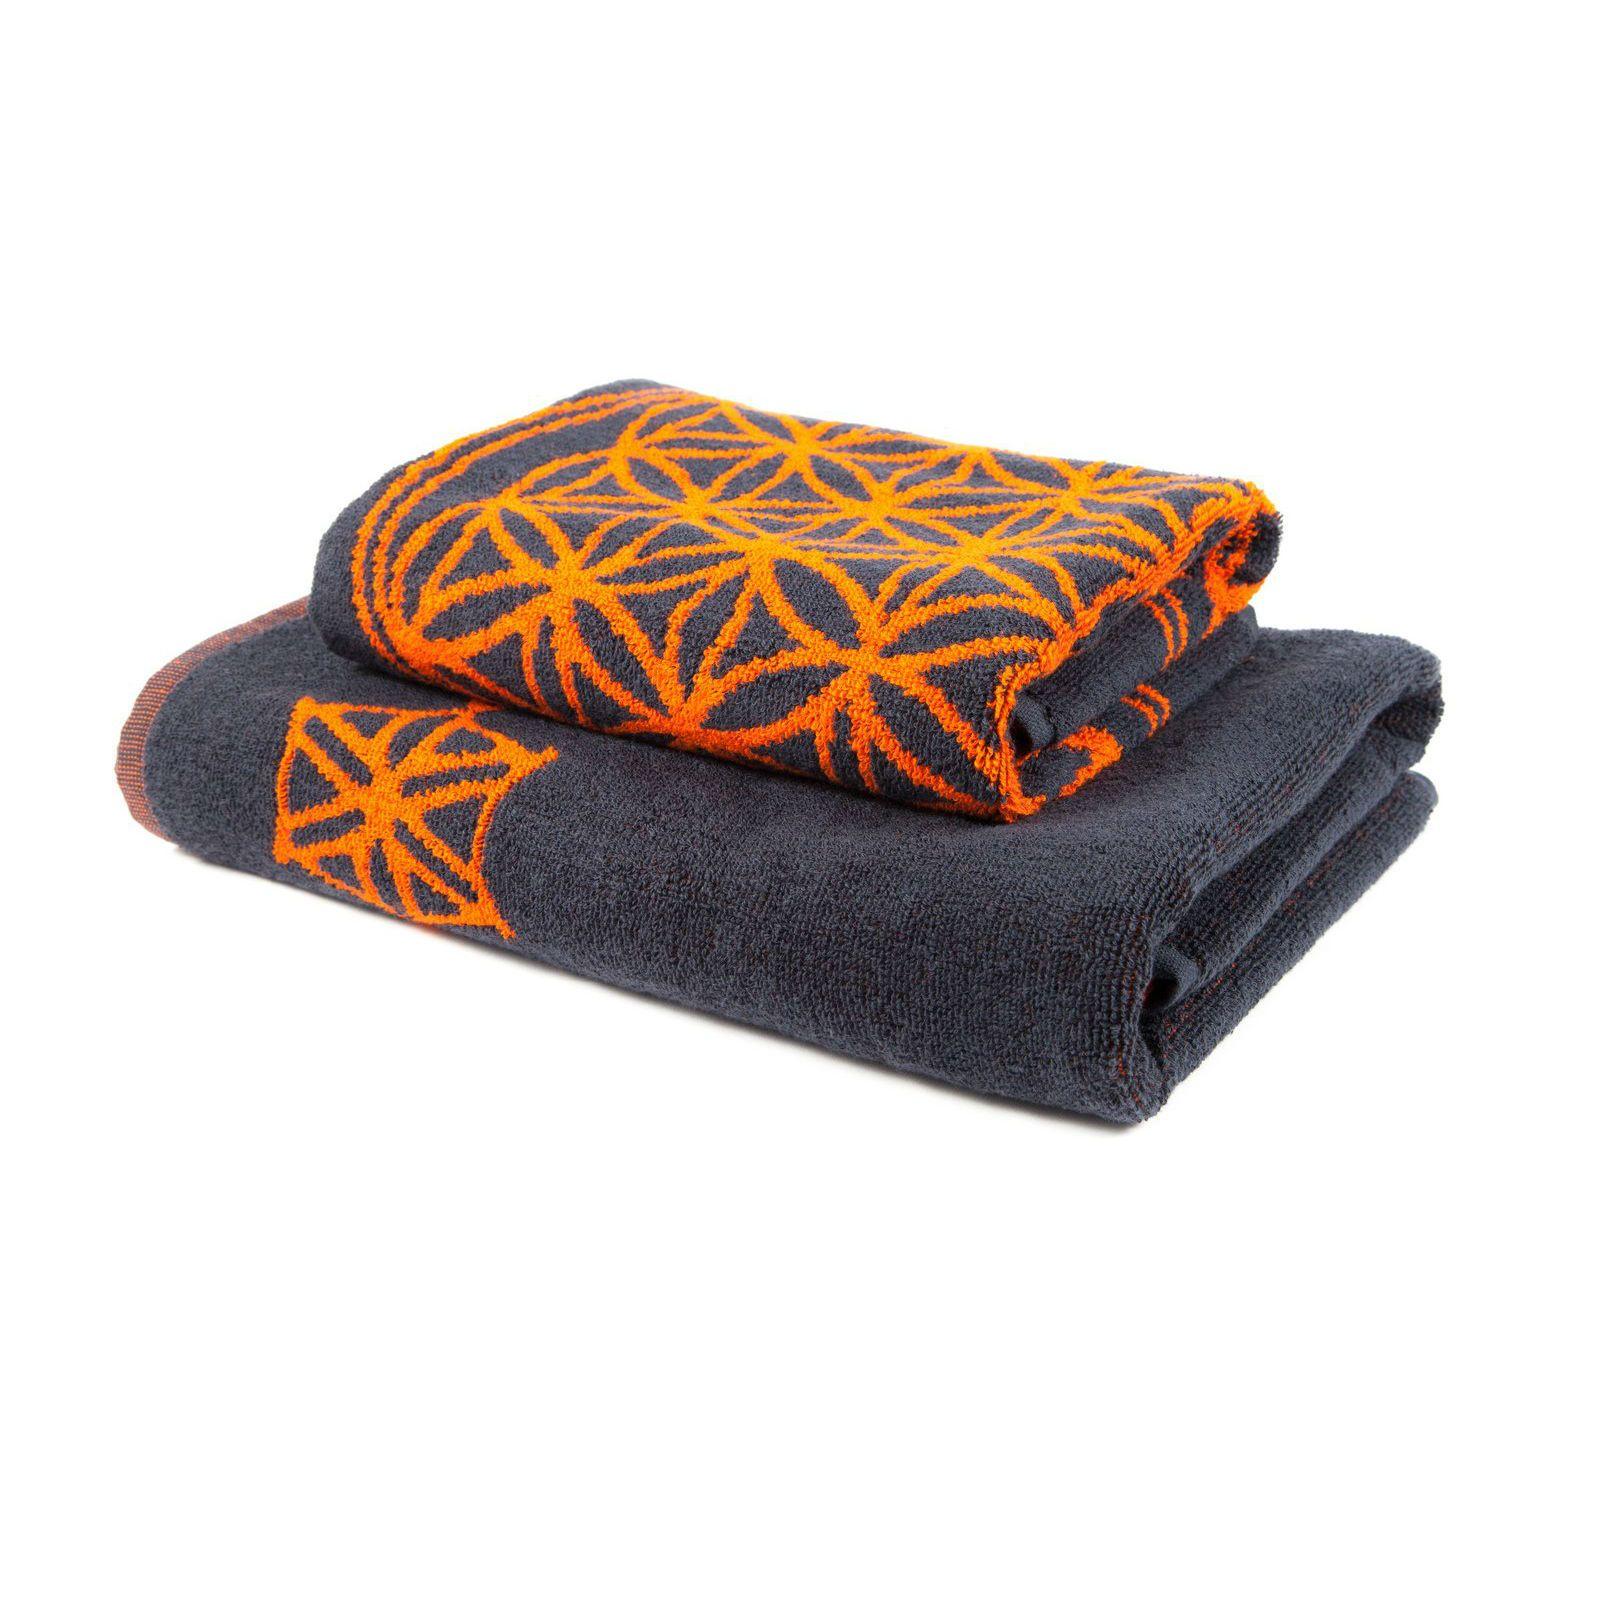 Bath Towels More Perfect Gift For Your Loved Ones By Mandalalifeartshop Orange Bathroom Accessories Towel Set Orange Bathrooms